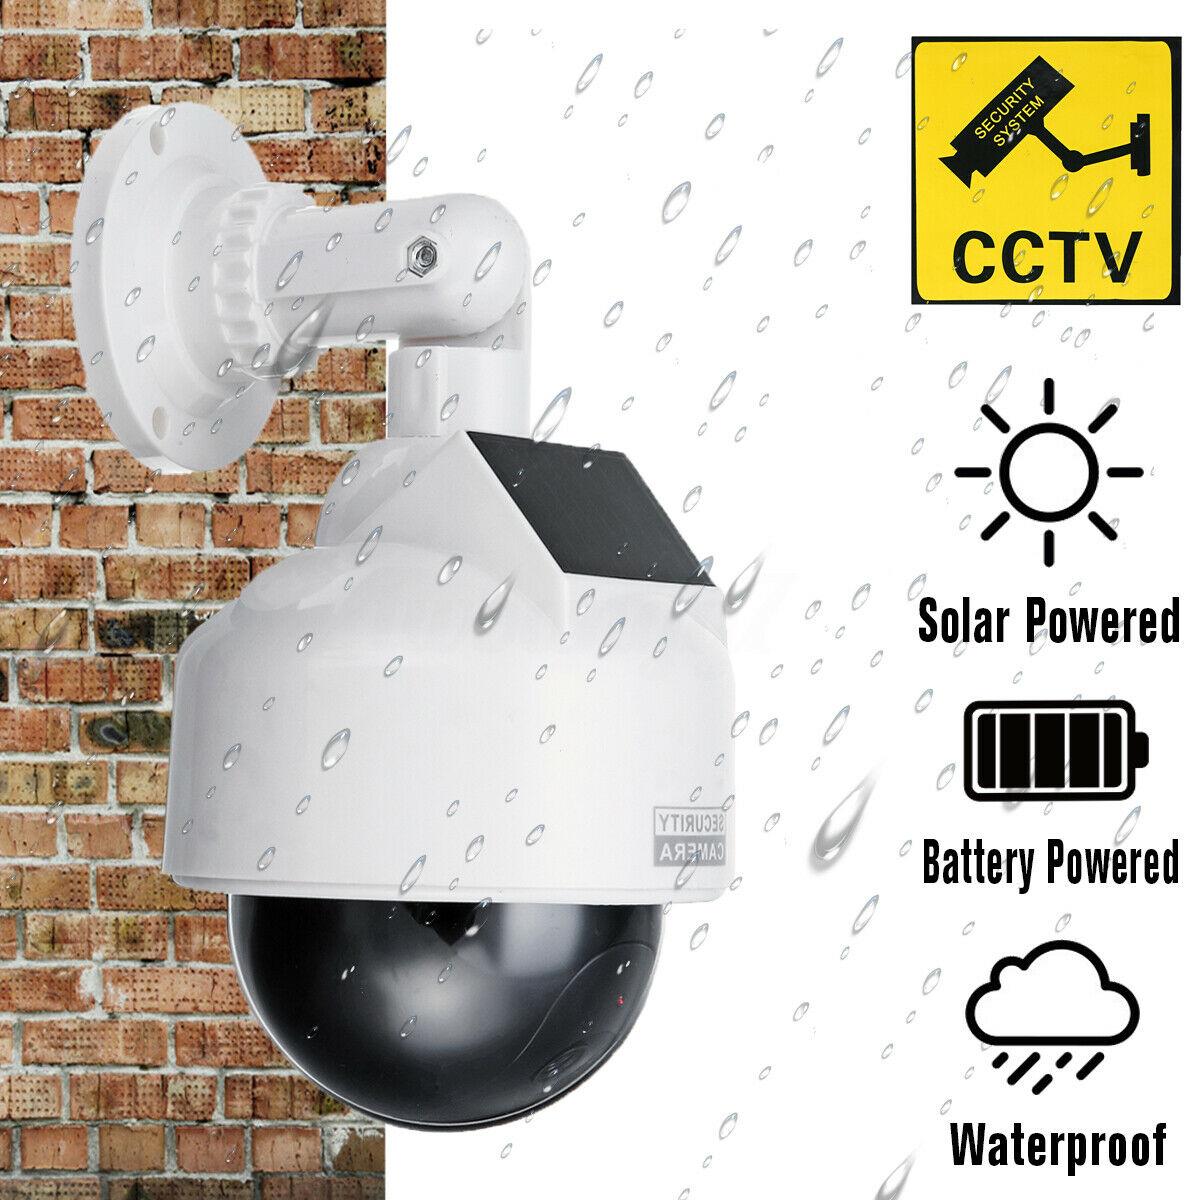 Solar Power Fake CCTV Camera Realistic Dummy Security Simulation Monitor white